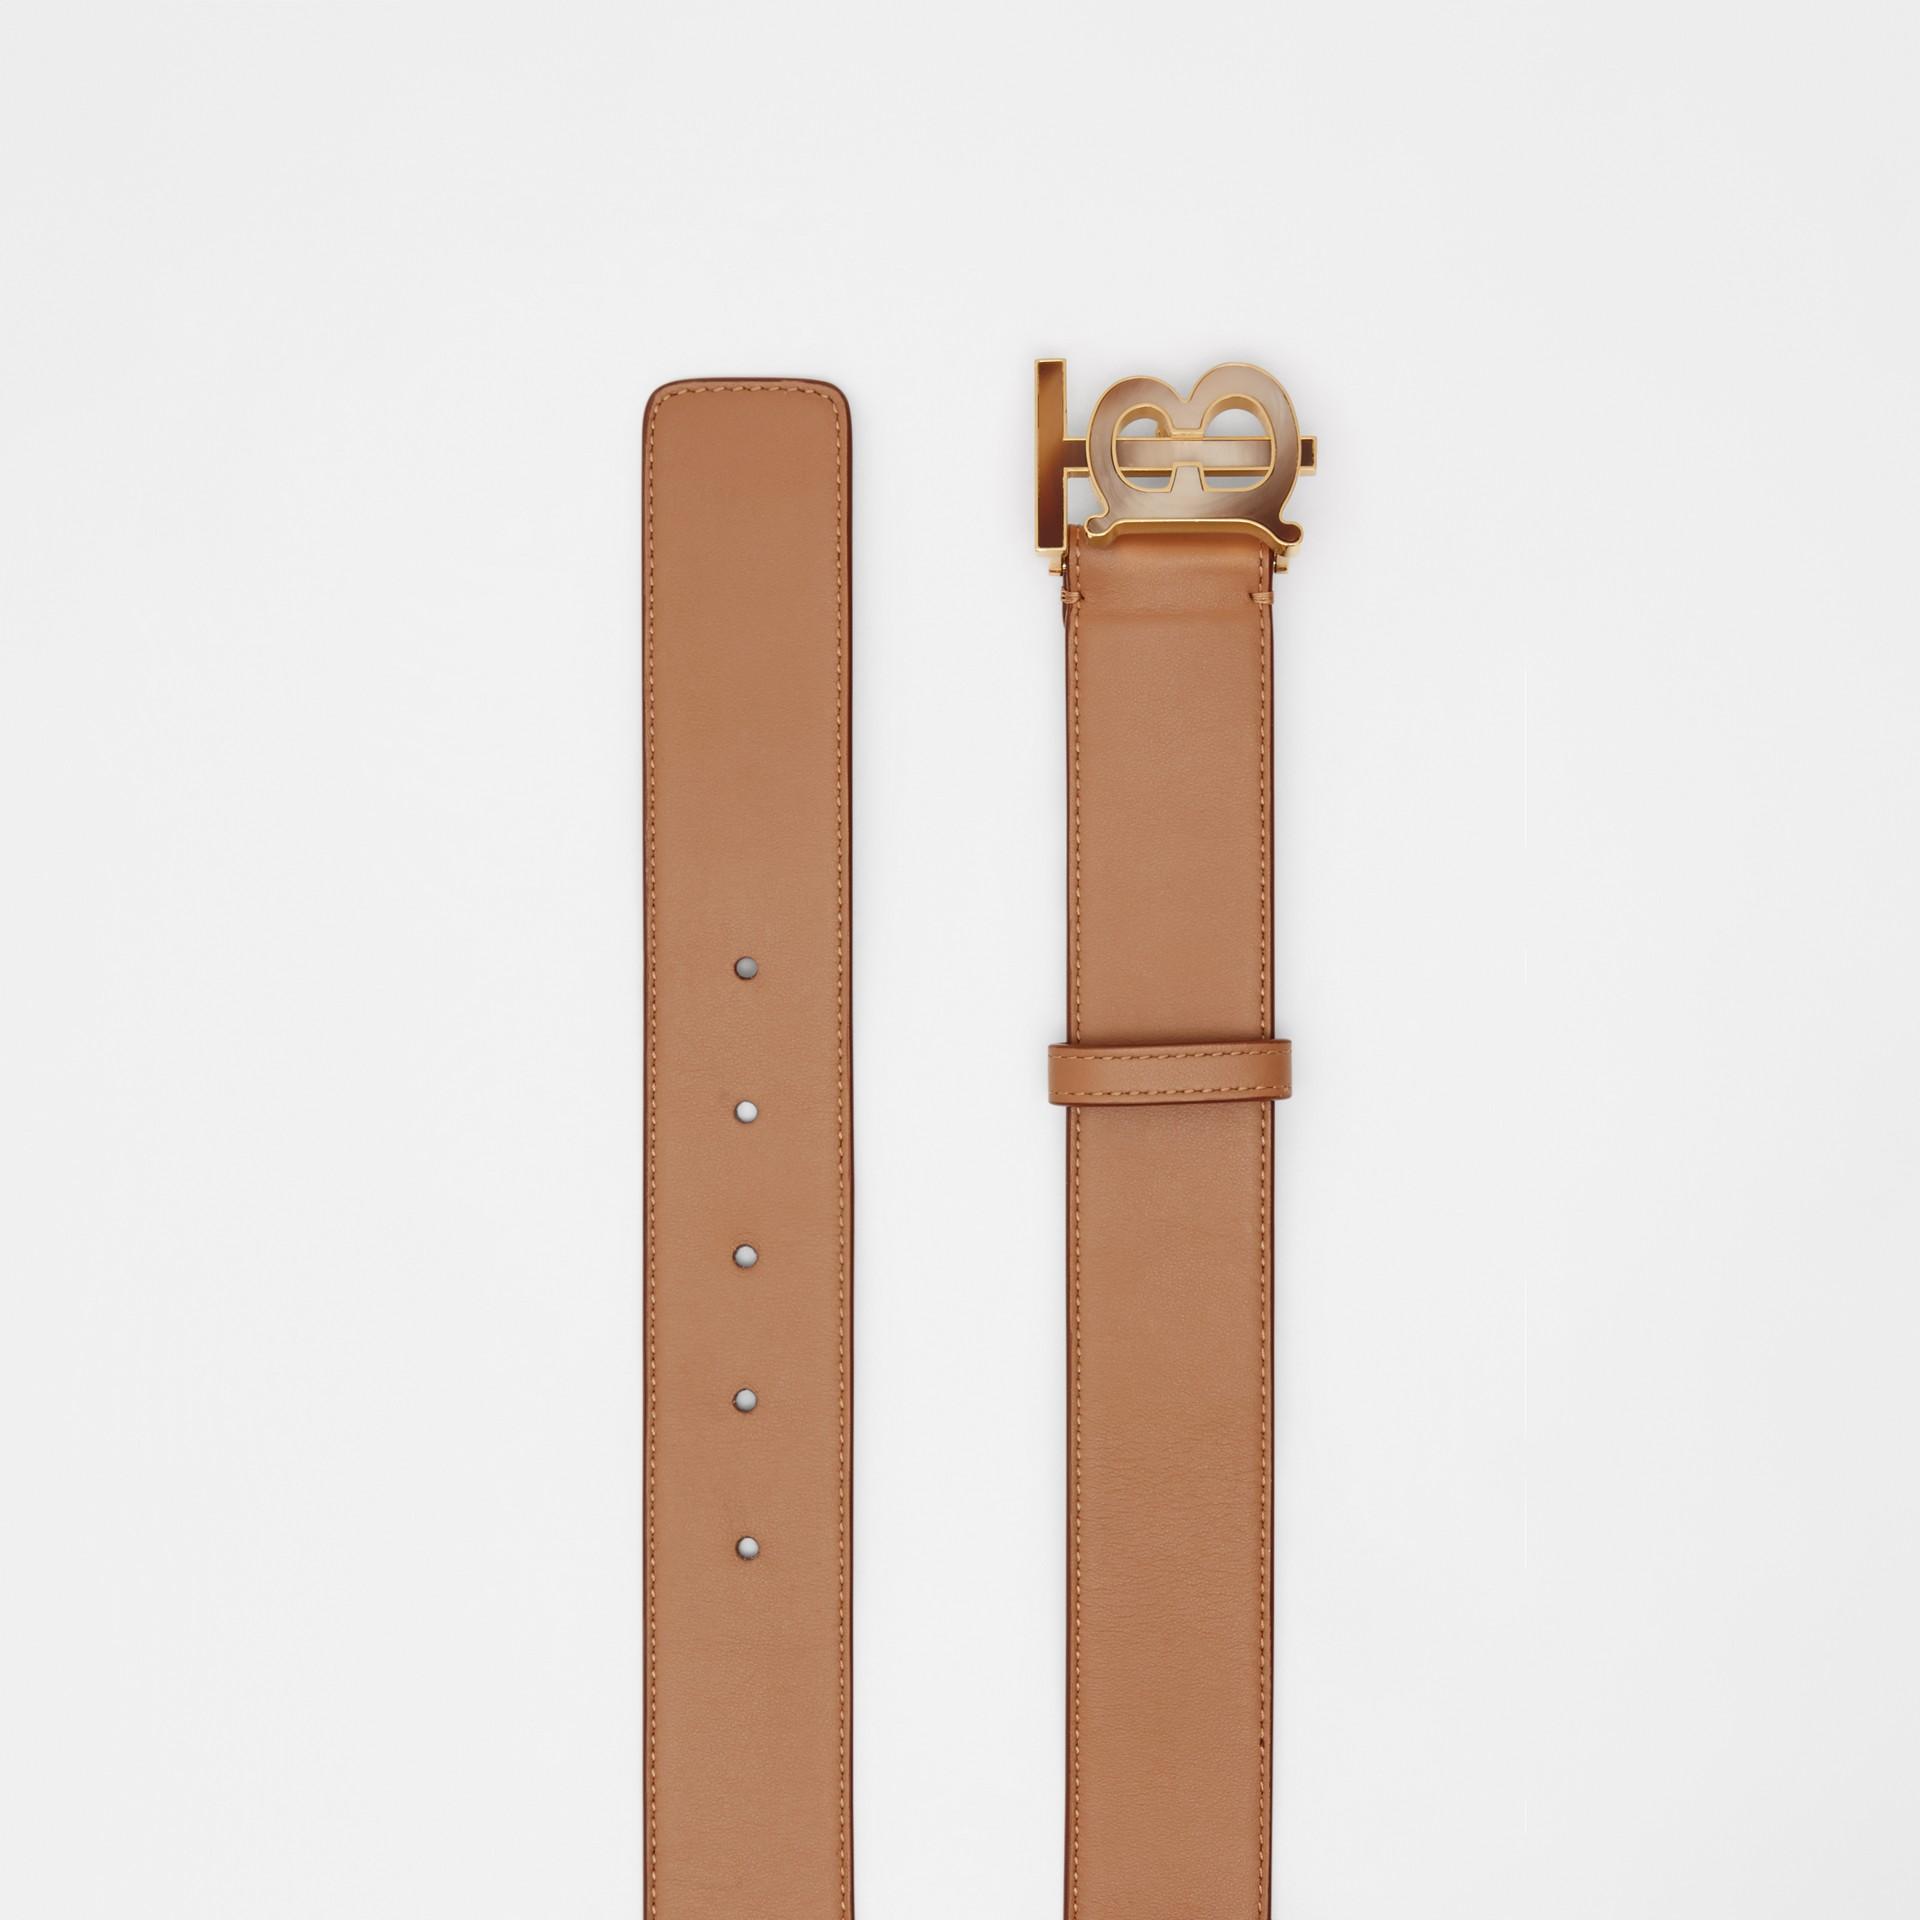 Monogram Motif Leather Belt in Light Camel - Women | Burberry United Kingdom - gallery image 4